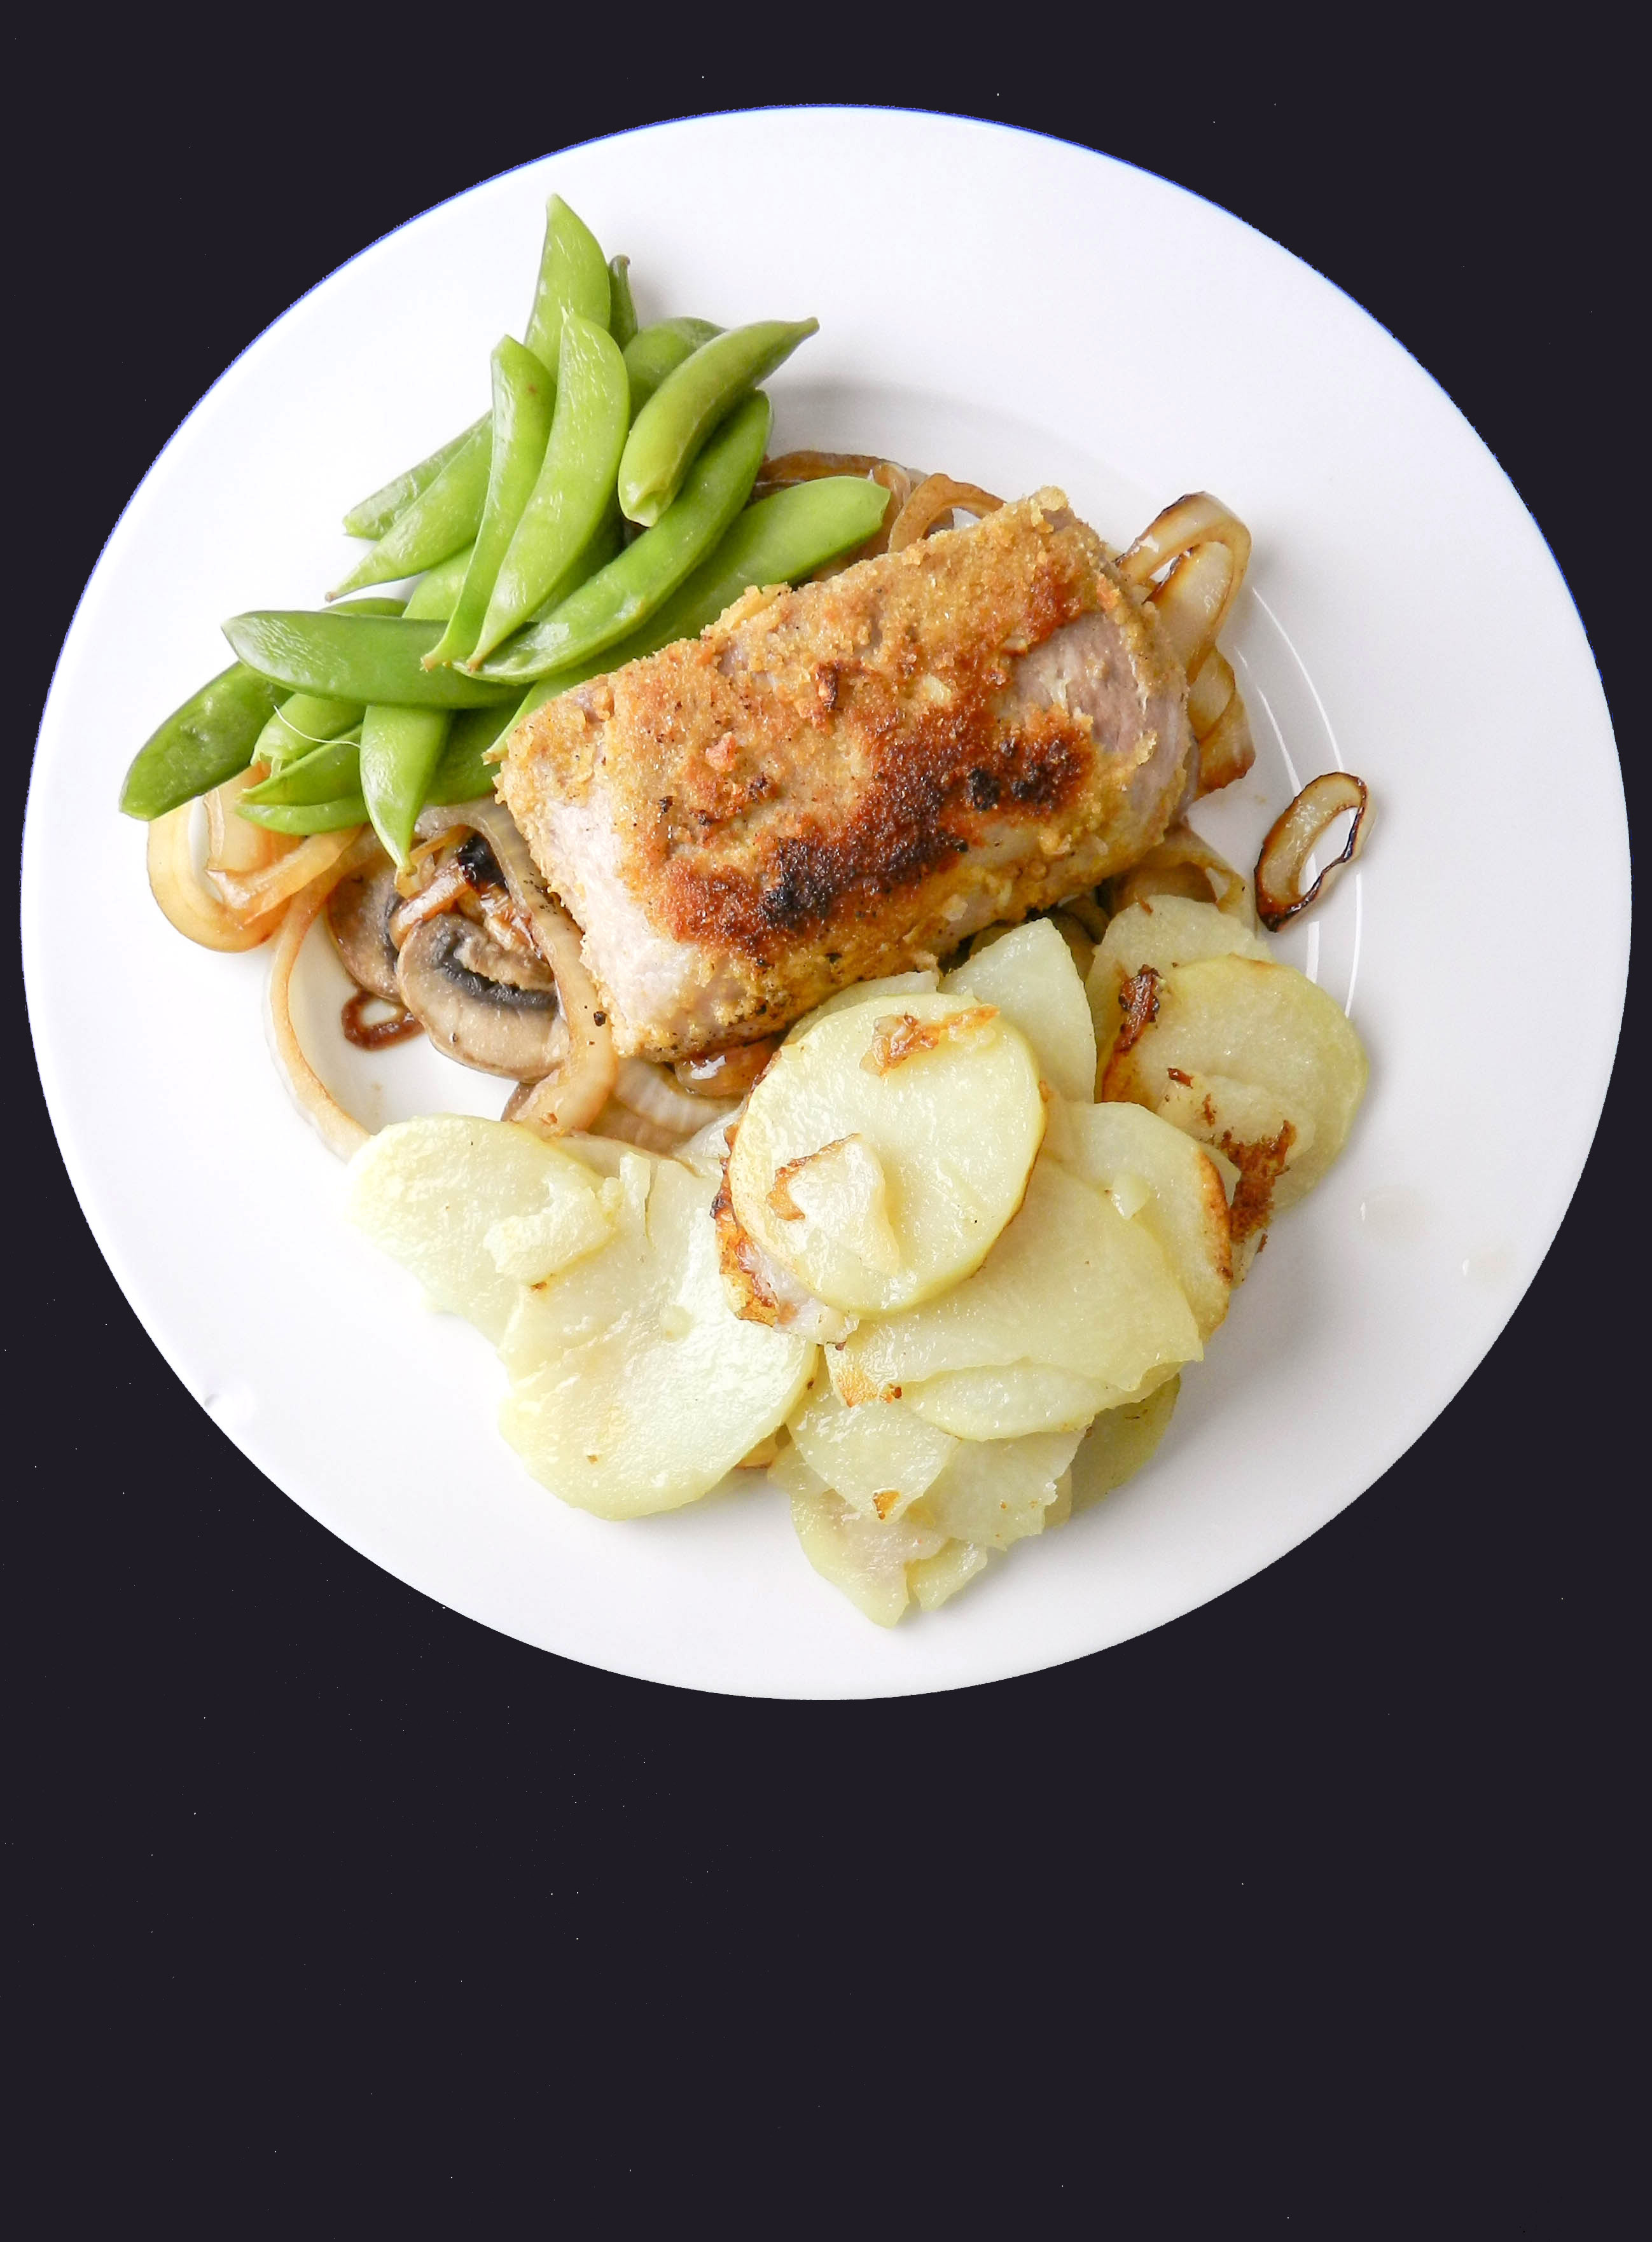 Pork Chops Sous Vide  Sous Vide Pork Chops Grandma s Style Discovery Cooking